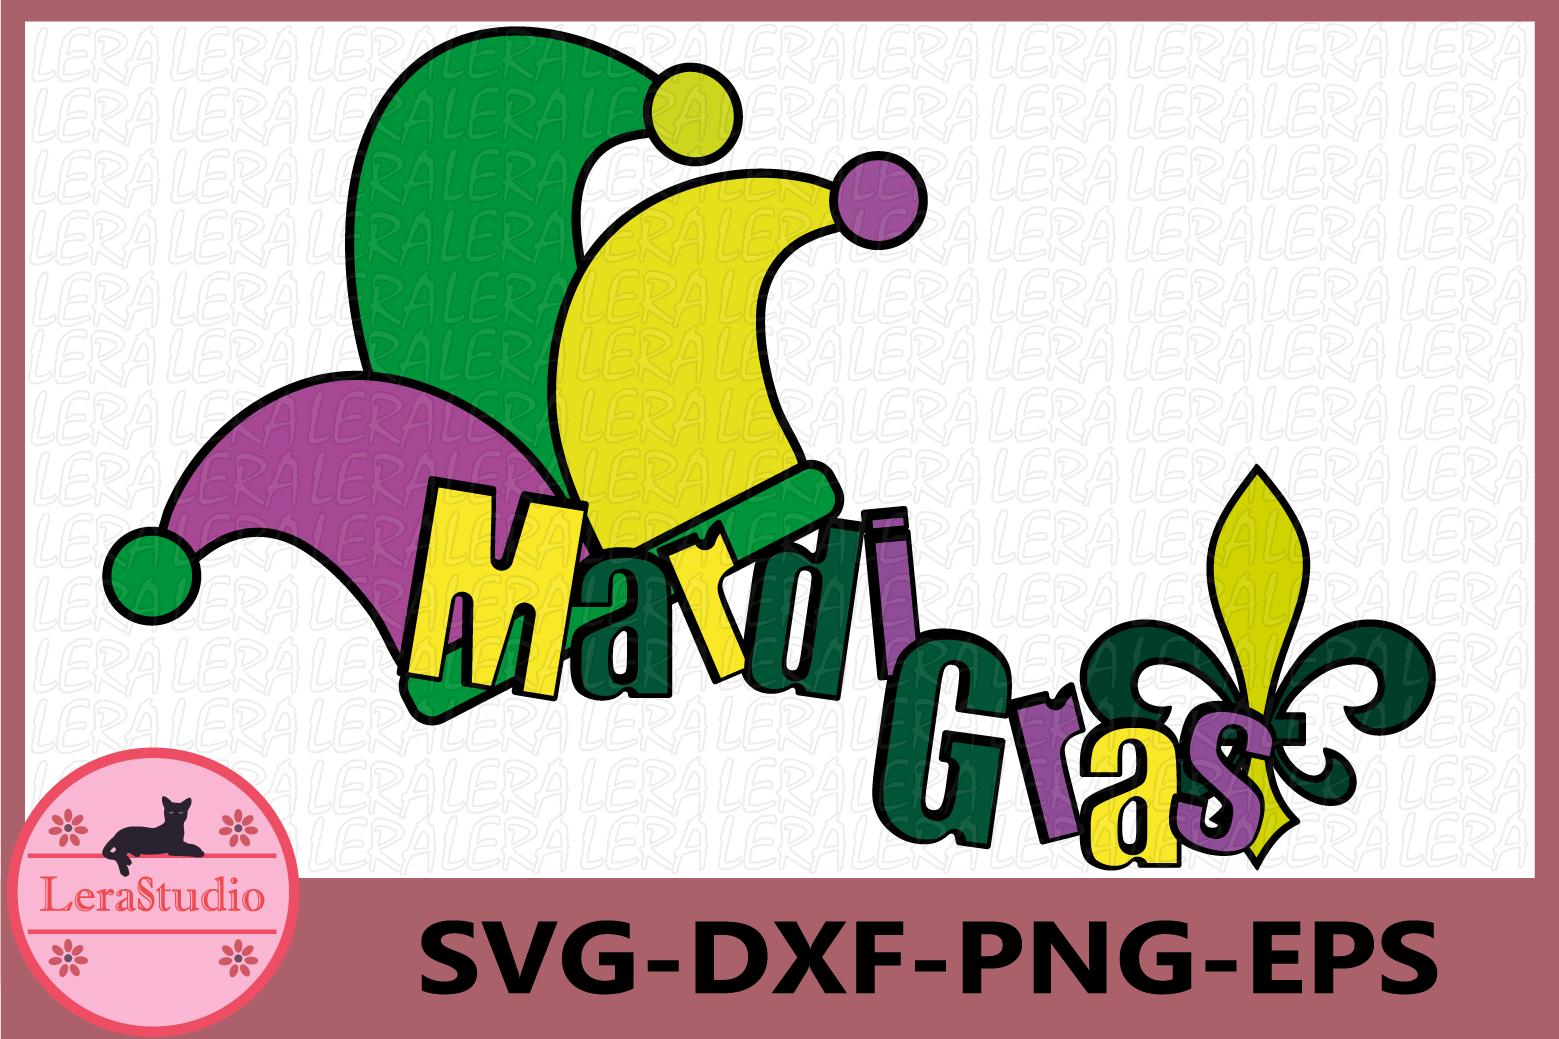 Mardi Gras Svg, Mardi Gras Clip Art, Silhouette example image 1